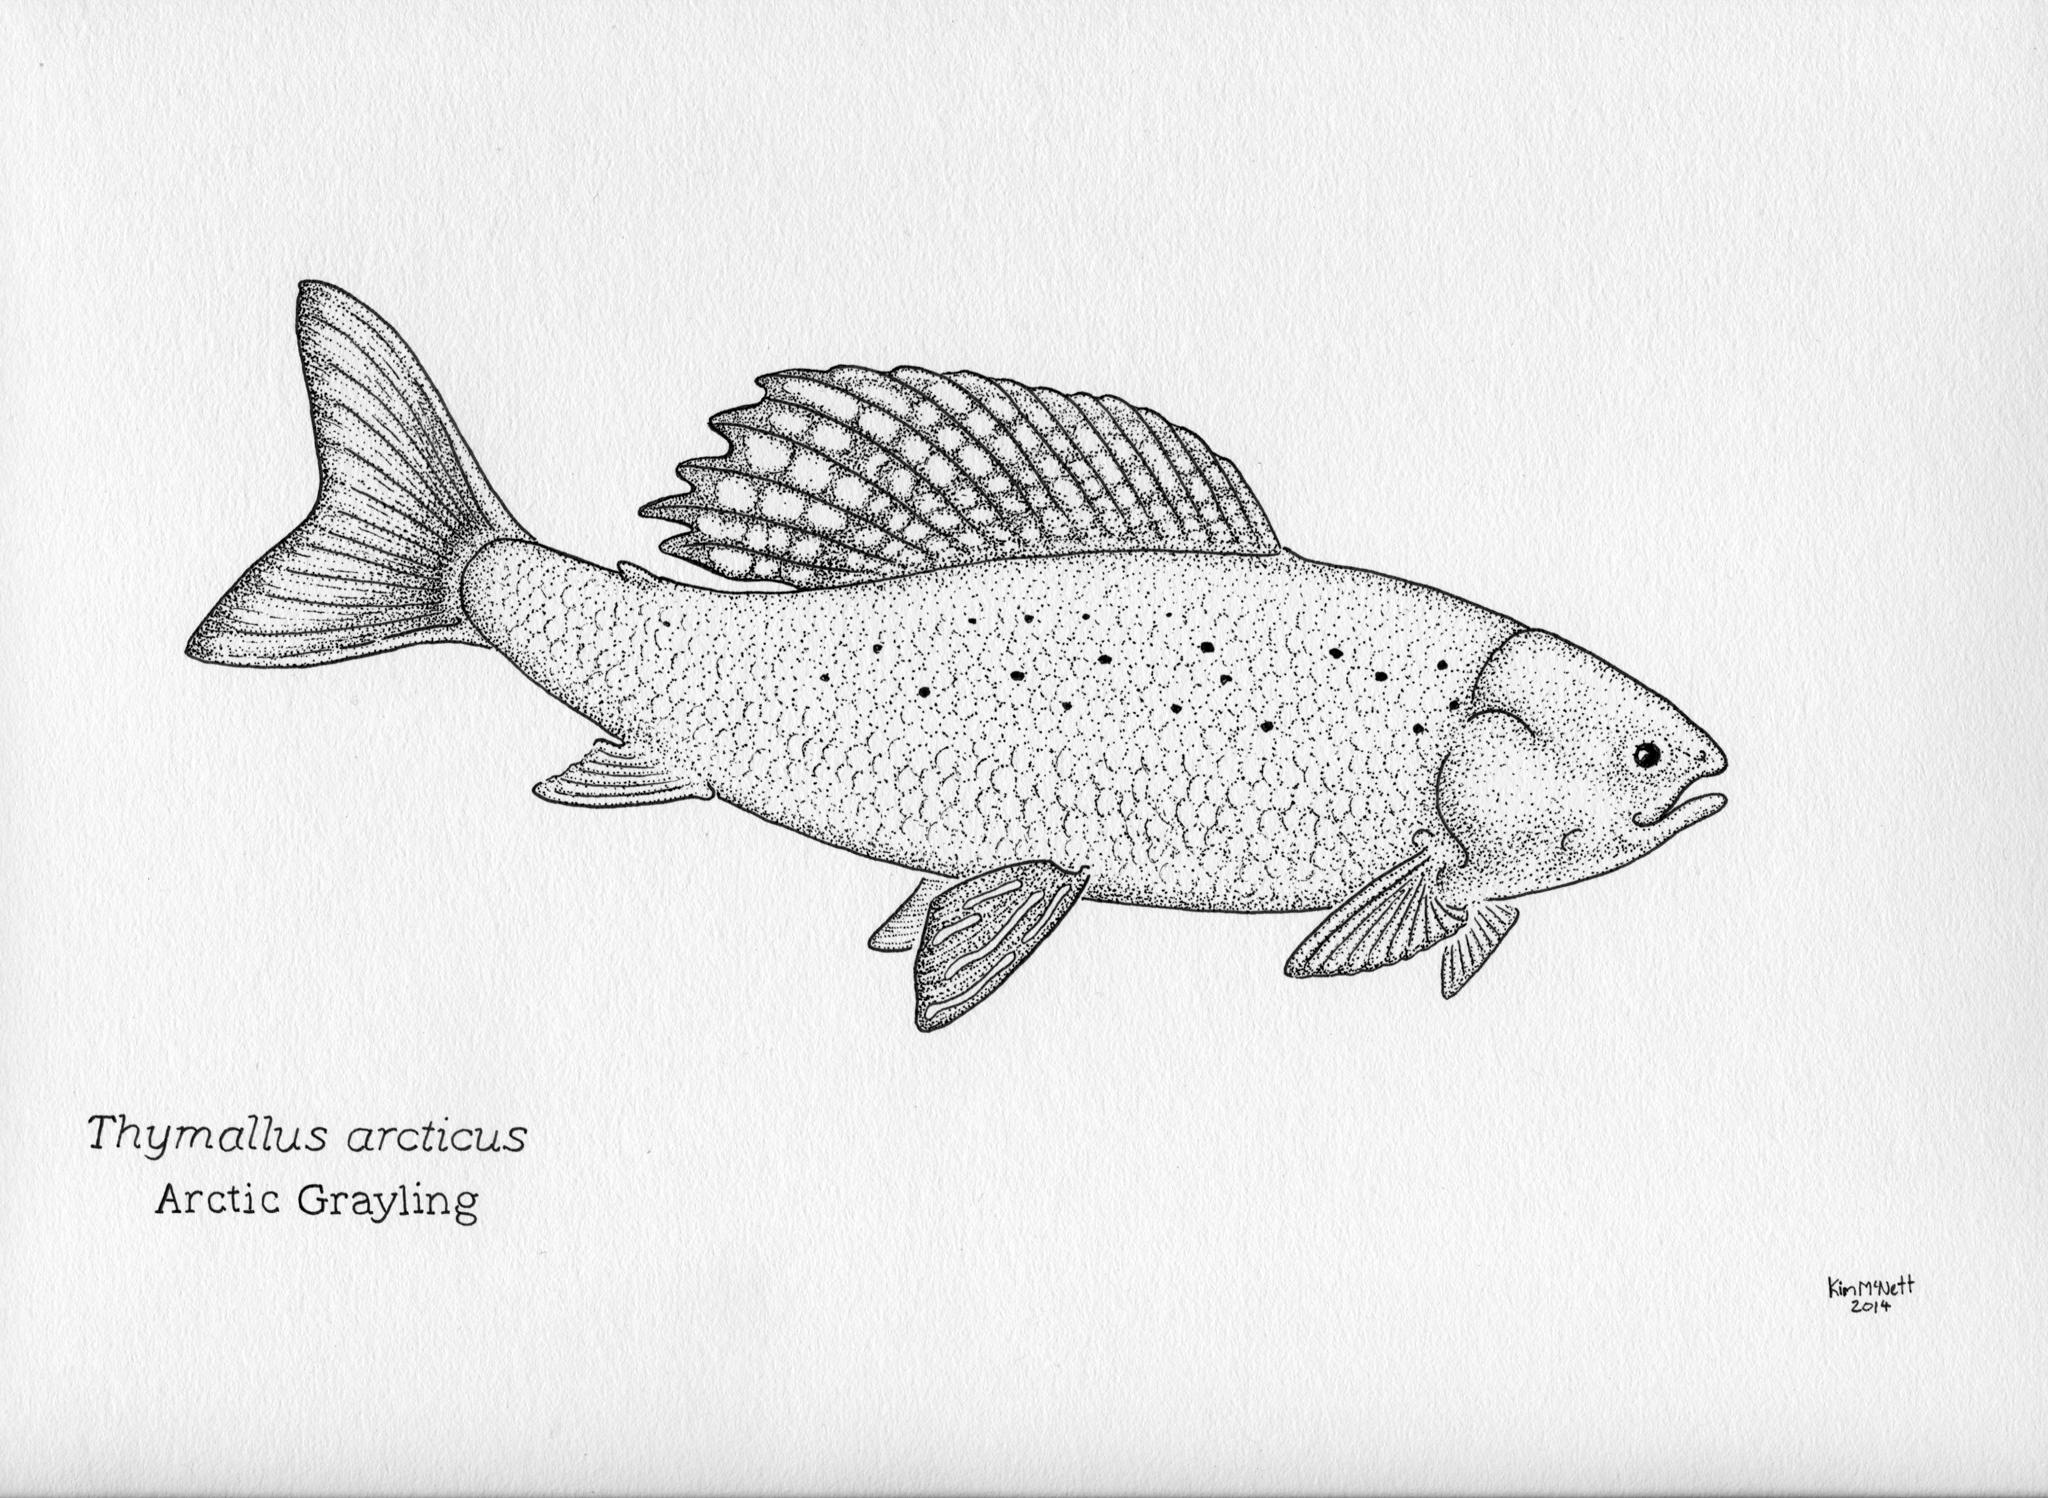 Arctic Grayling Thymallus arcticus drawing